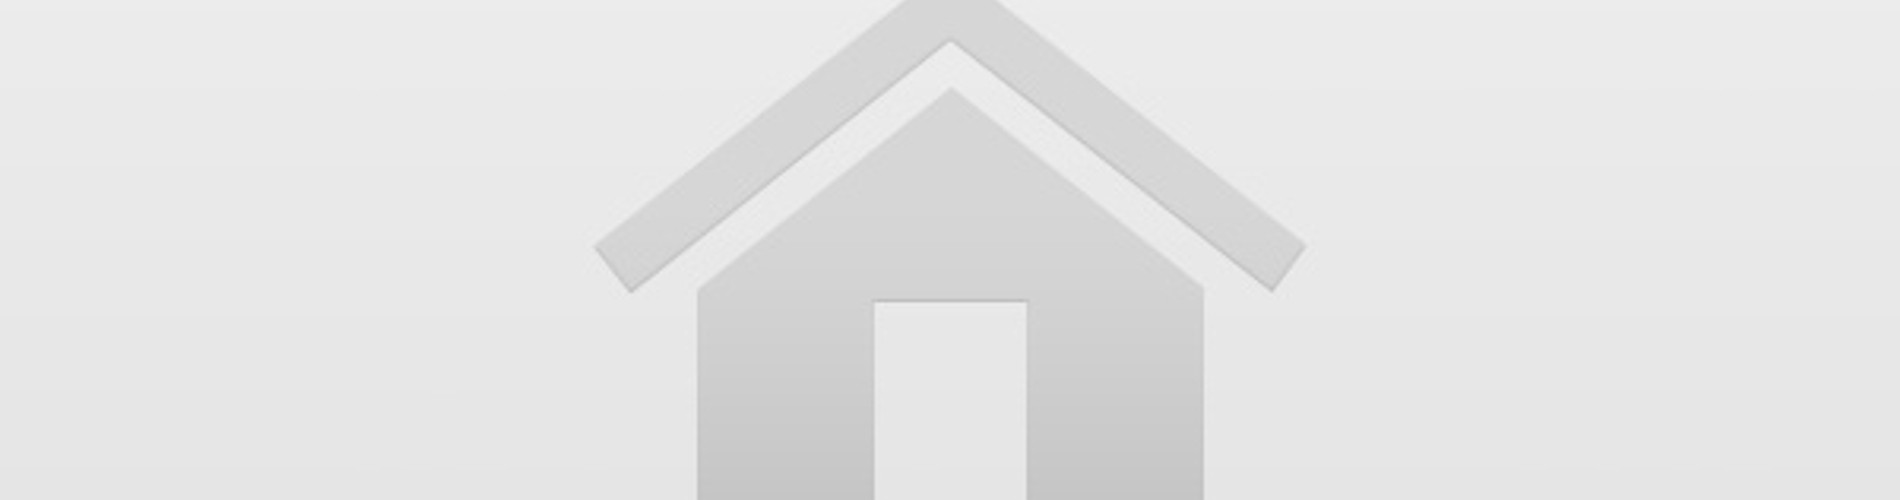 Vacation Rental 1 Bedroom Apartment - Pimlico/Zone1